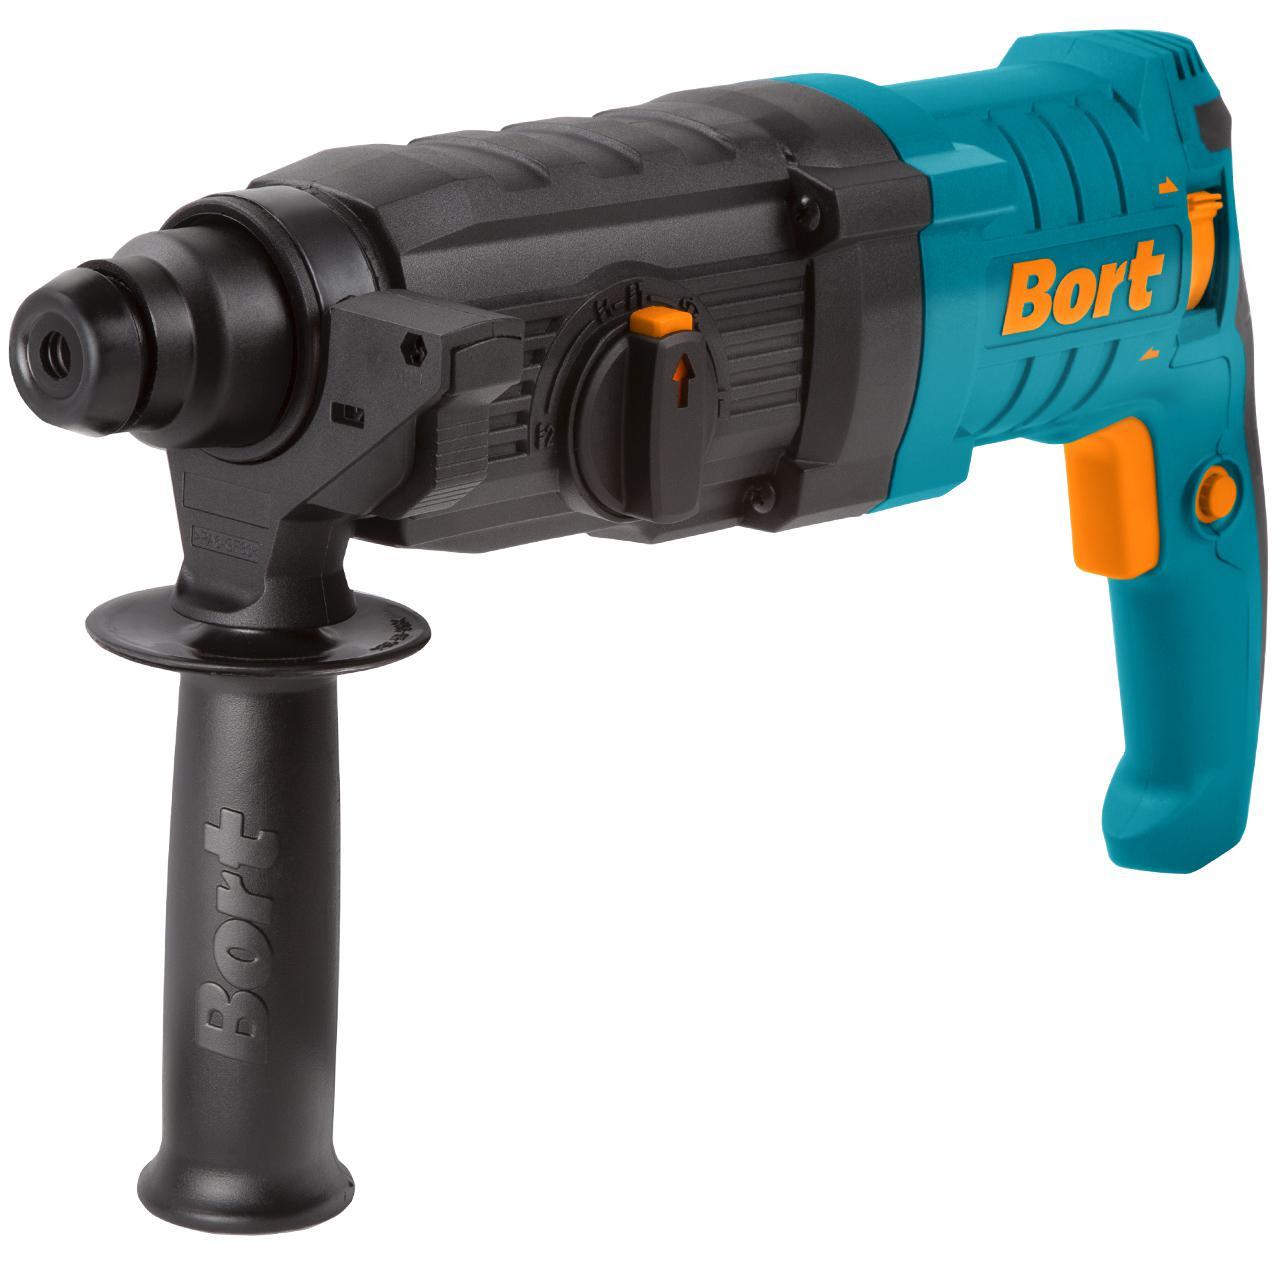 BORT BHD-800X2